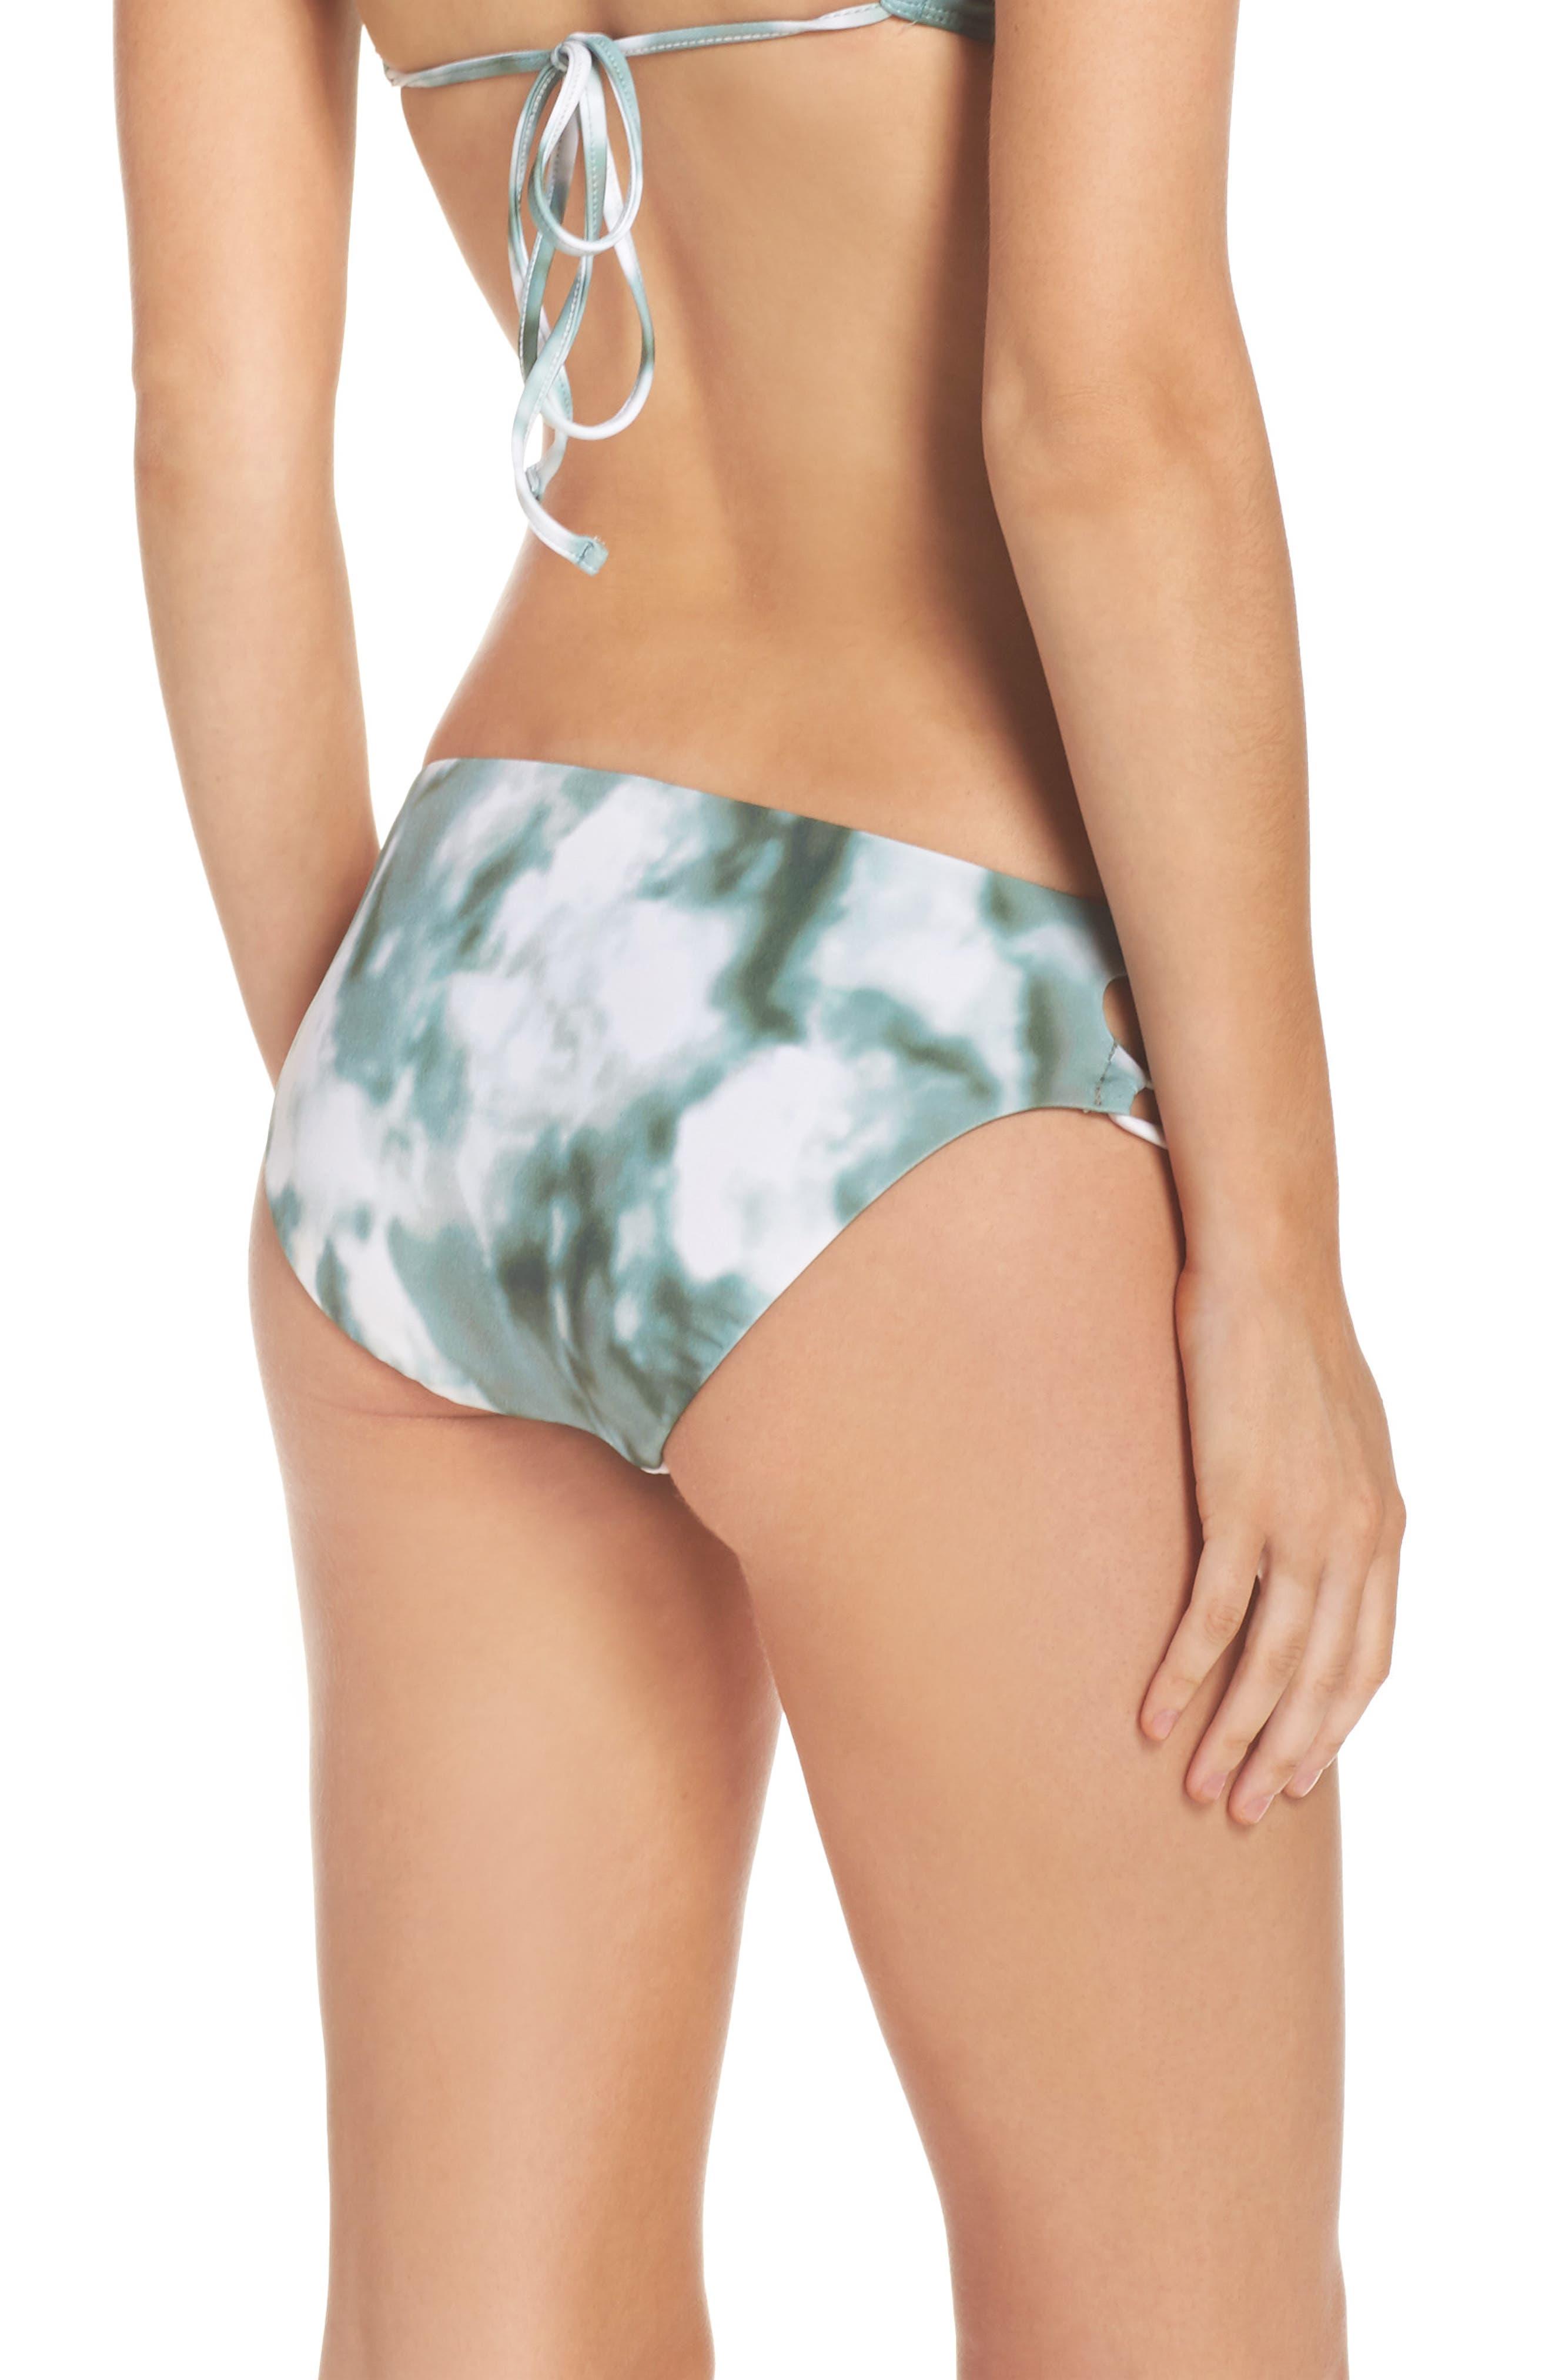 Indian Summer Bikini Bottoms,                             Alternate thumbnail 2, color,                             302